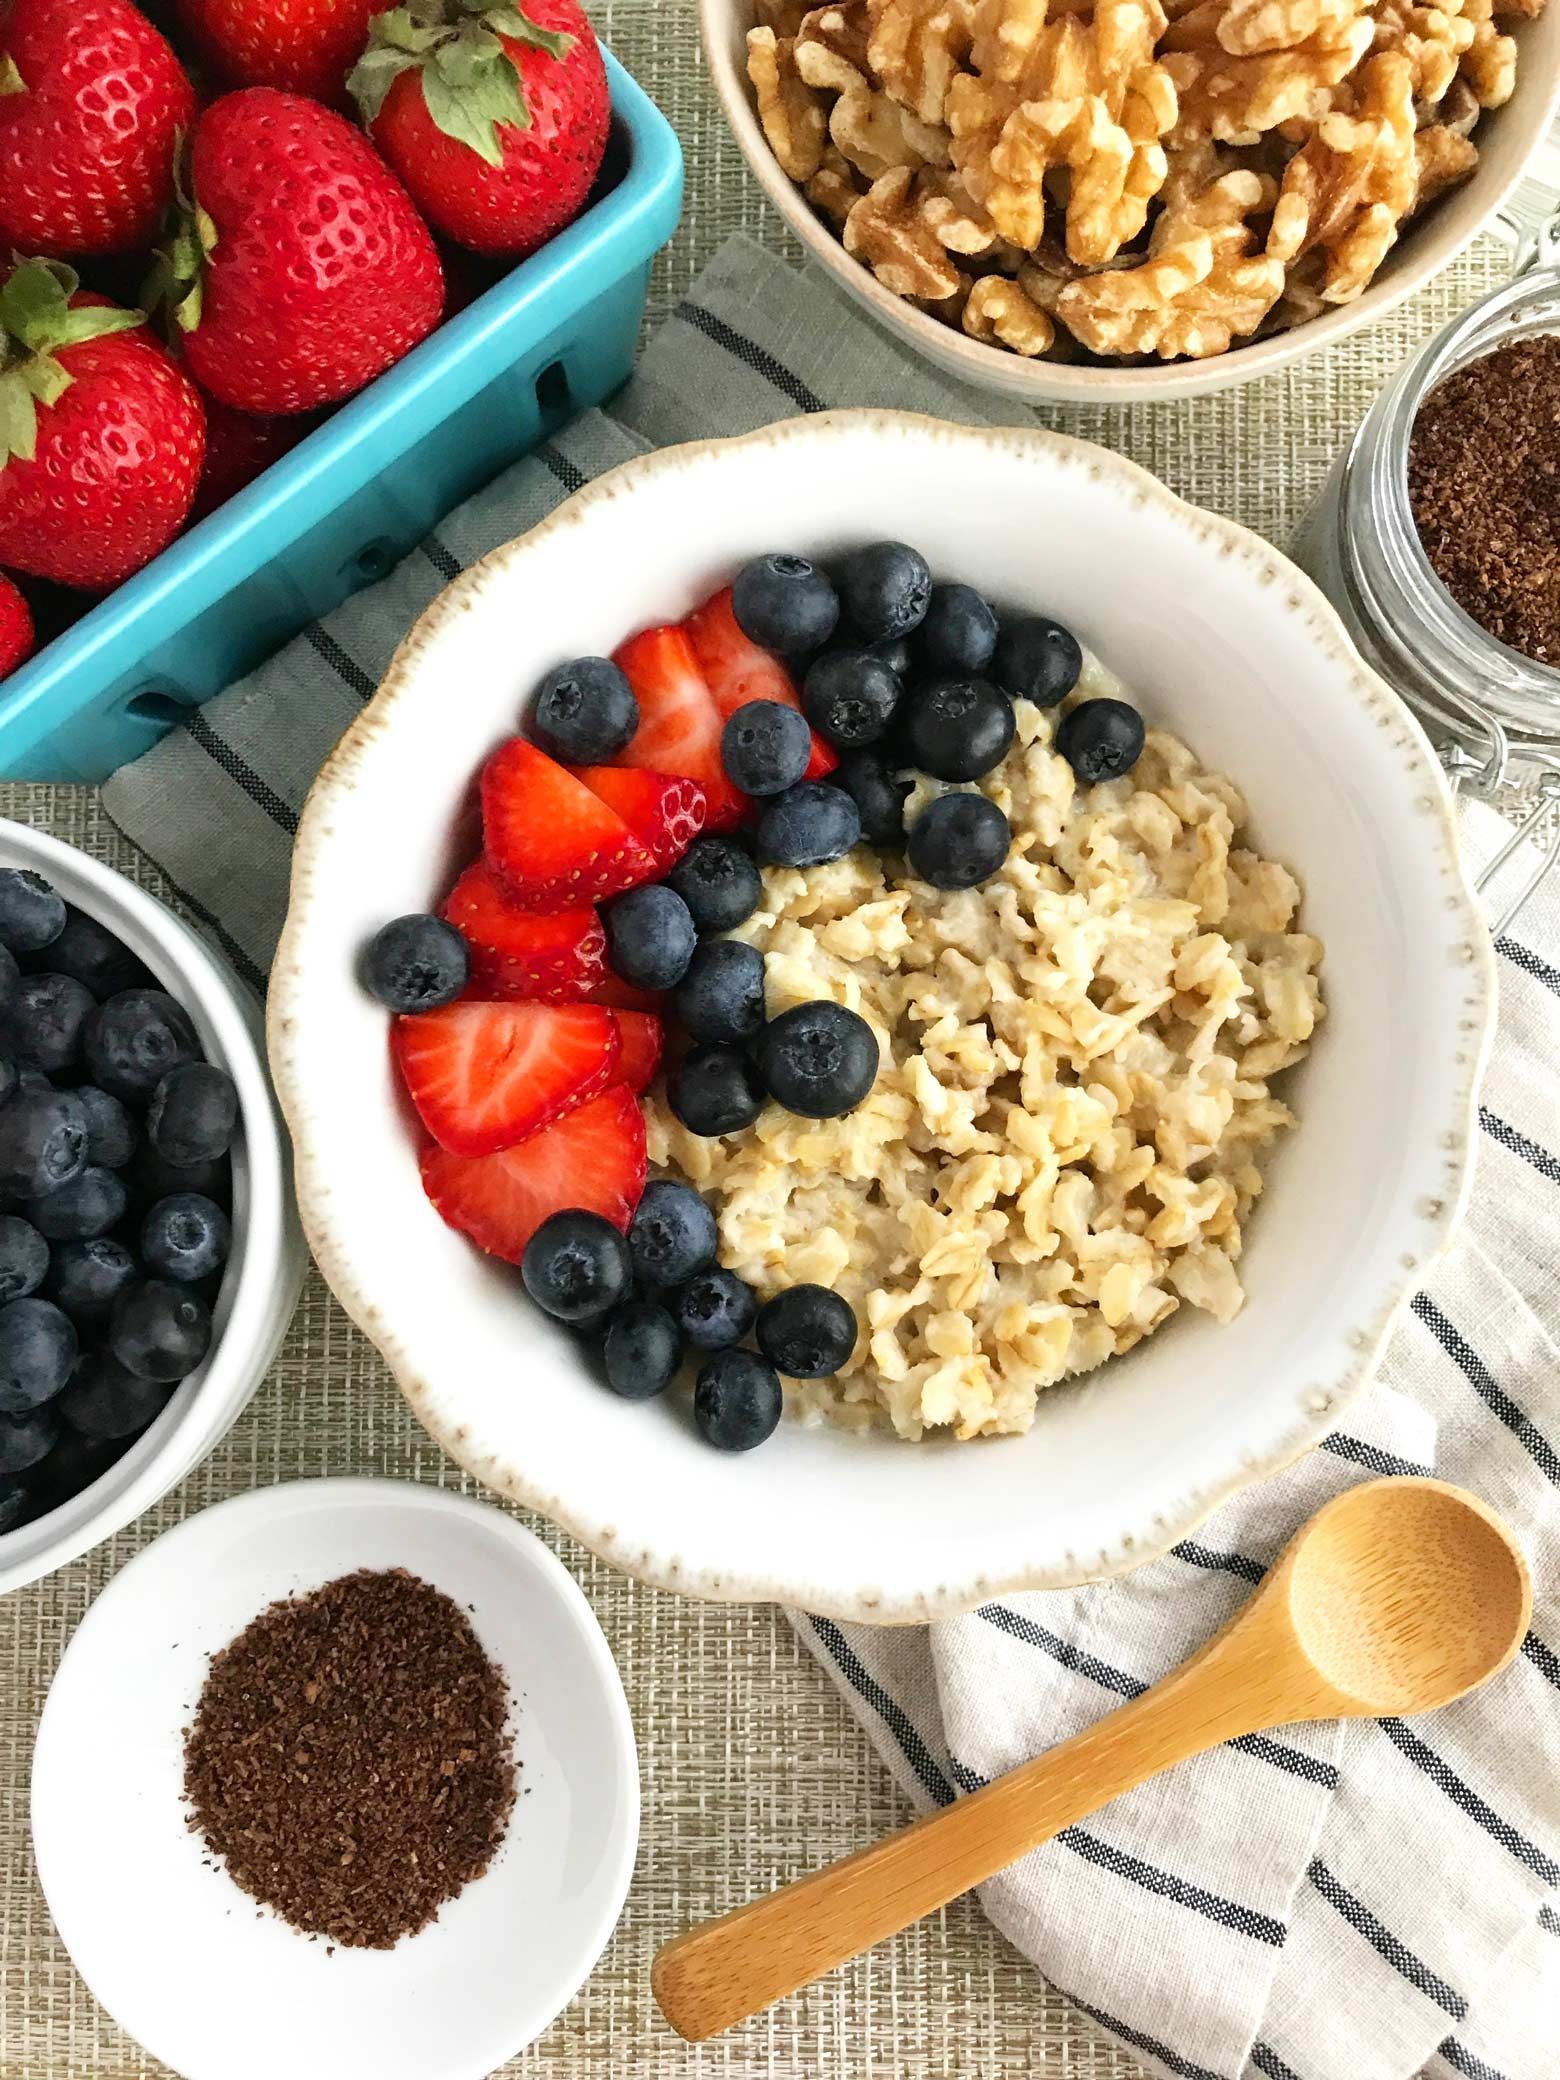 Easy oatmeal breakfast with chia flax and fresh berries